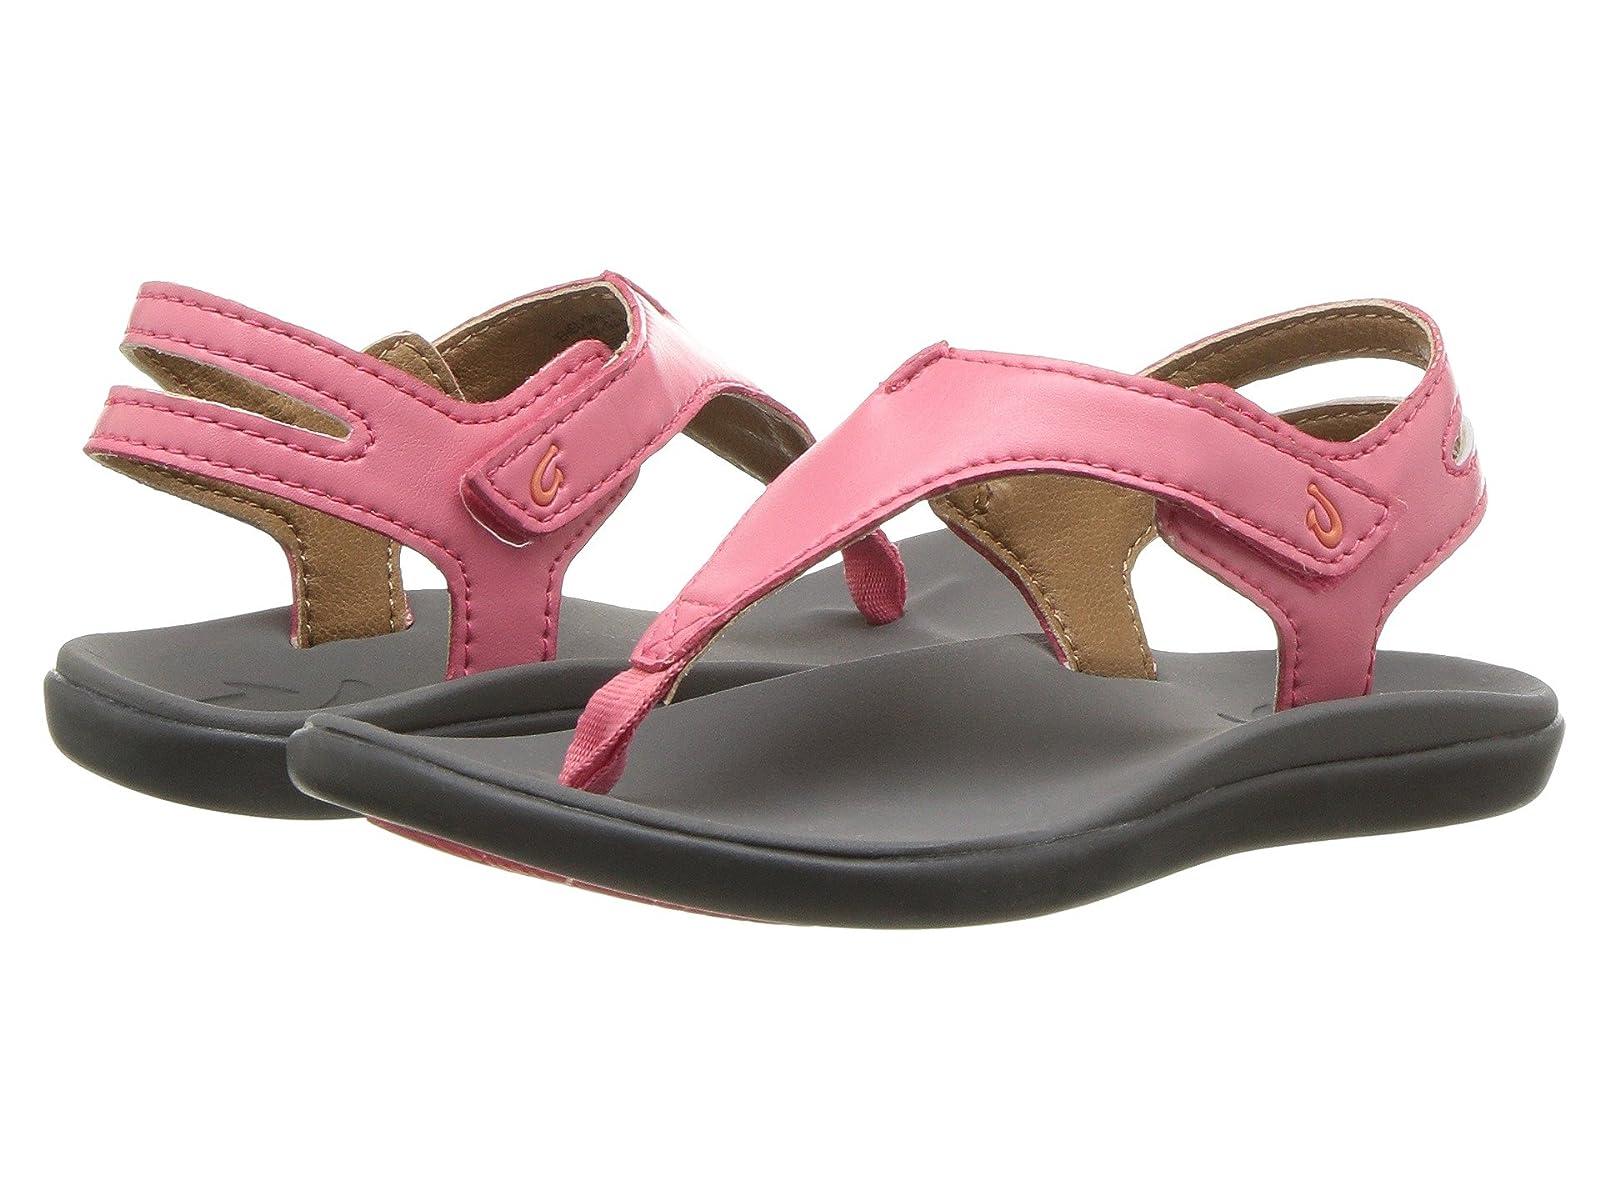 OluKai Kids Eheu (Toddler/Little Kid/Big Kid)Atmospheric grades have affordable shoes